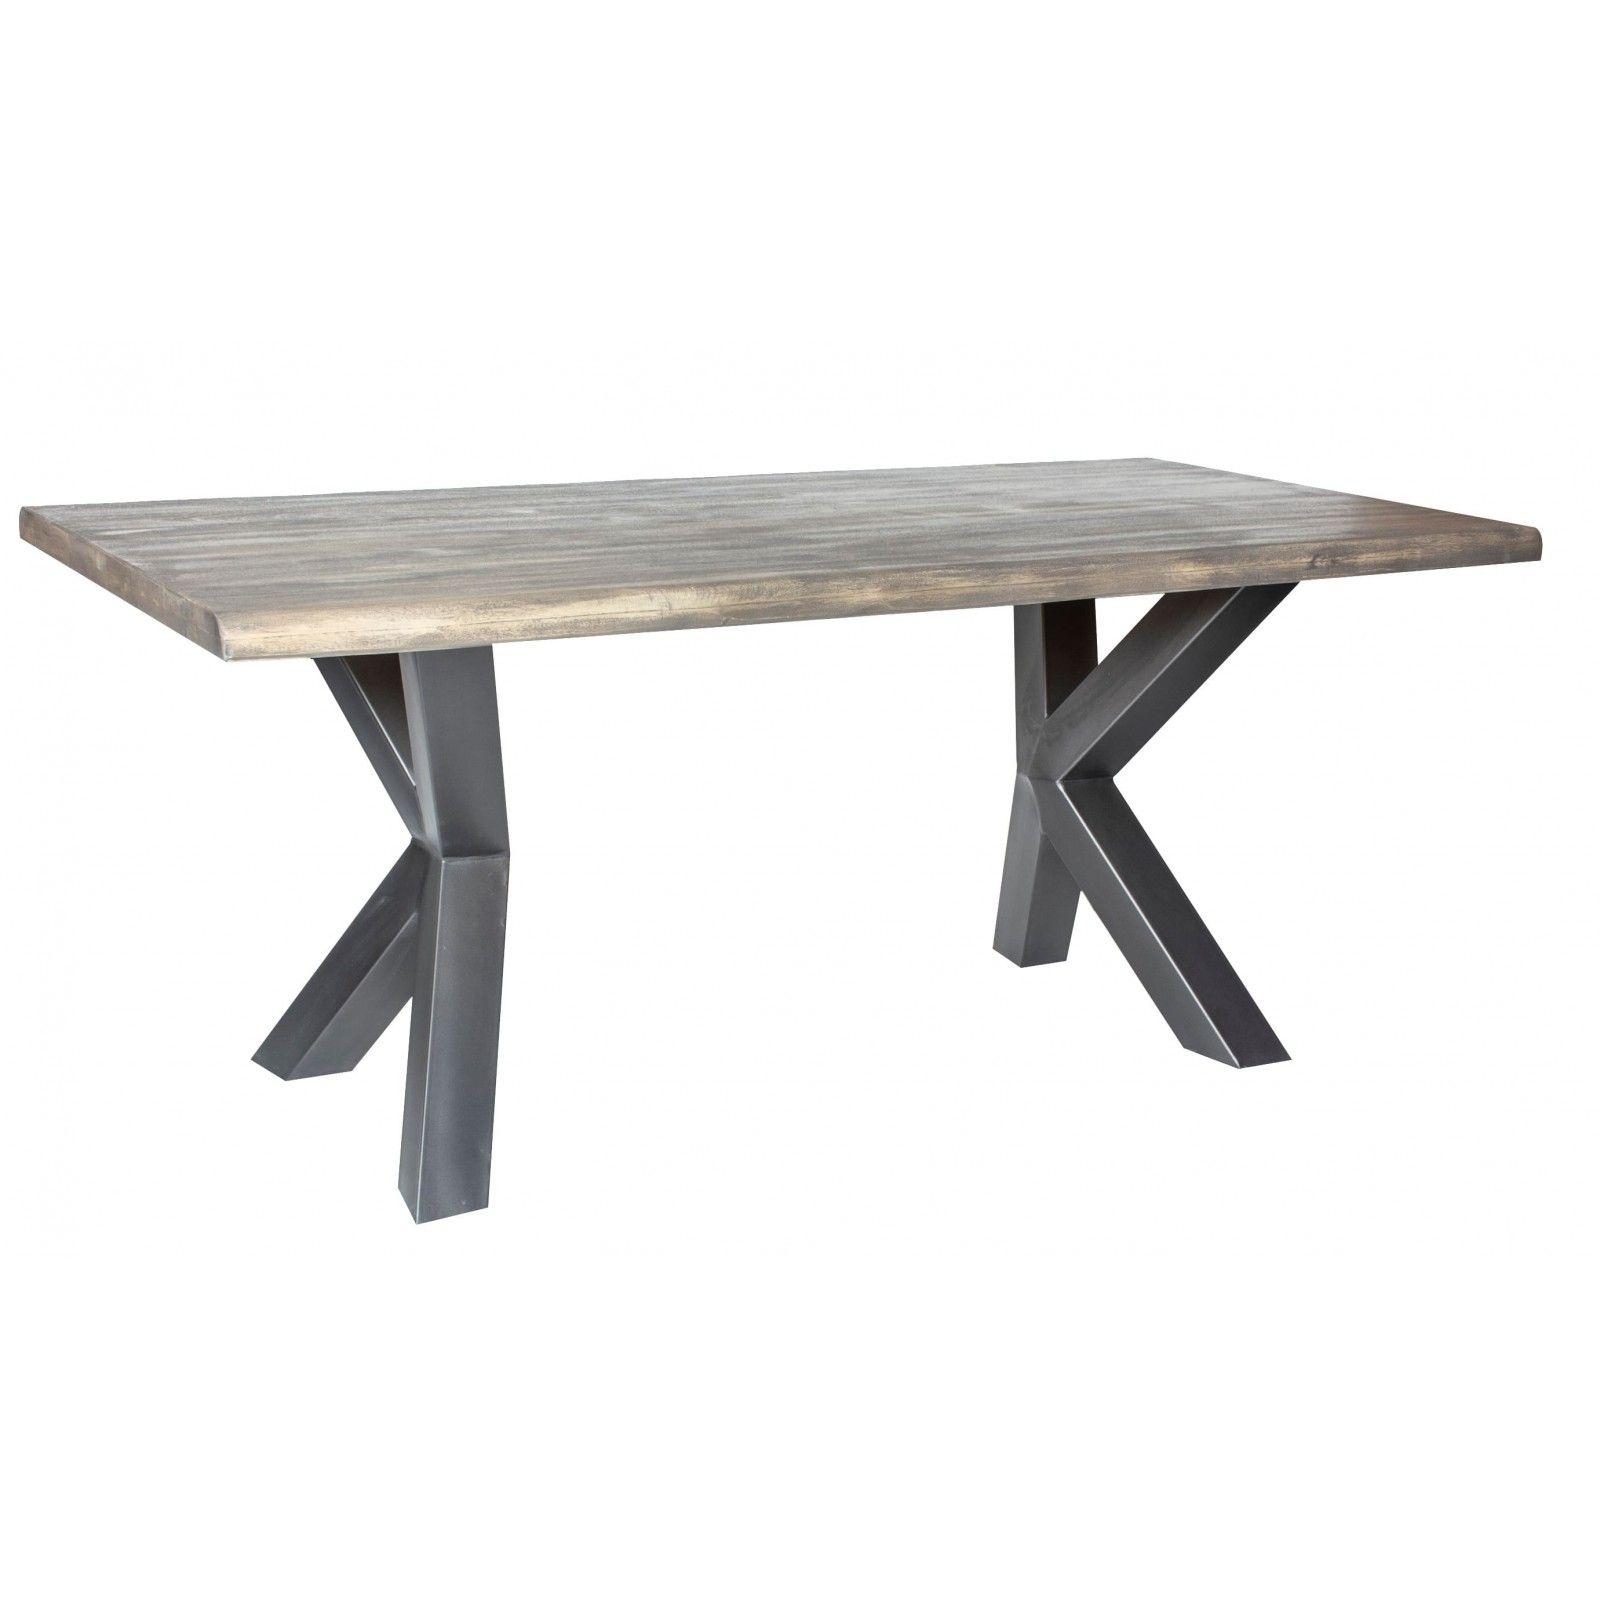 Table de repas New York en manguier massif et métal